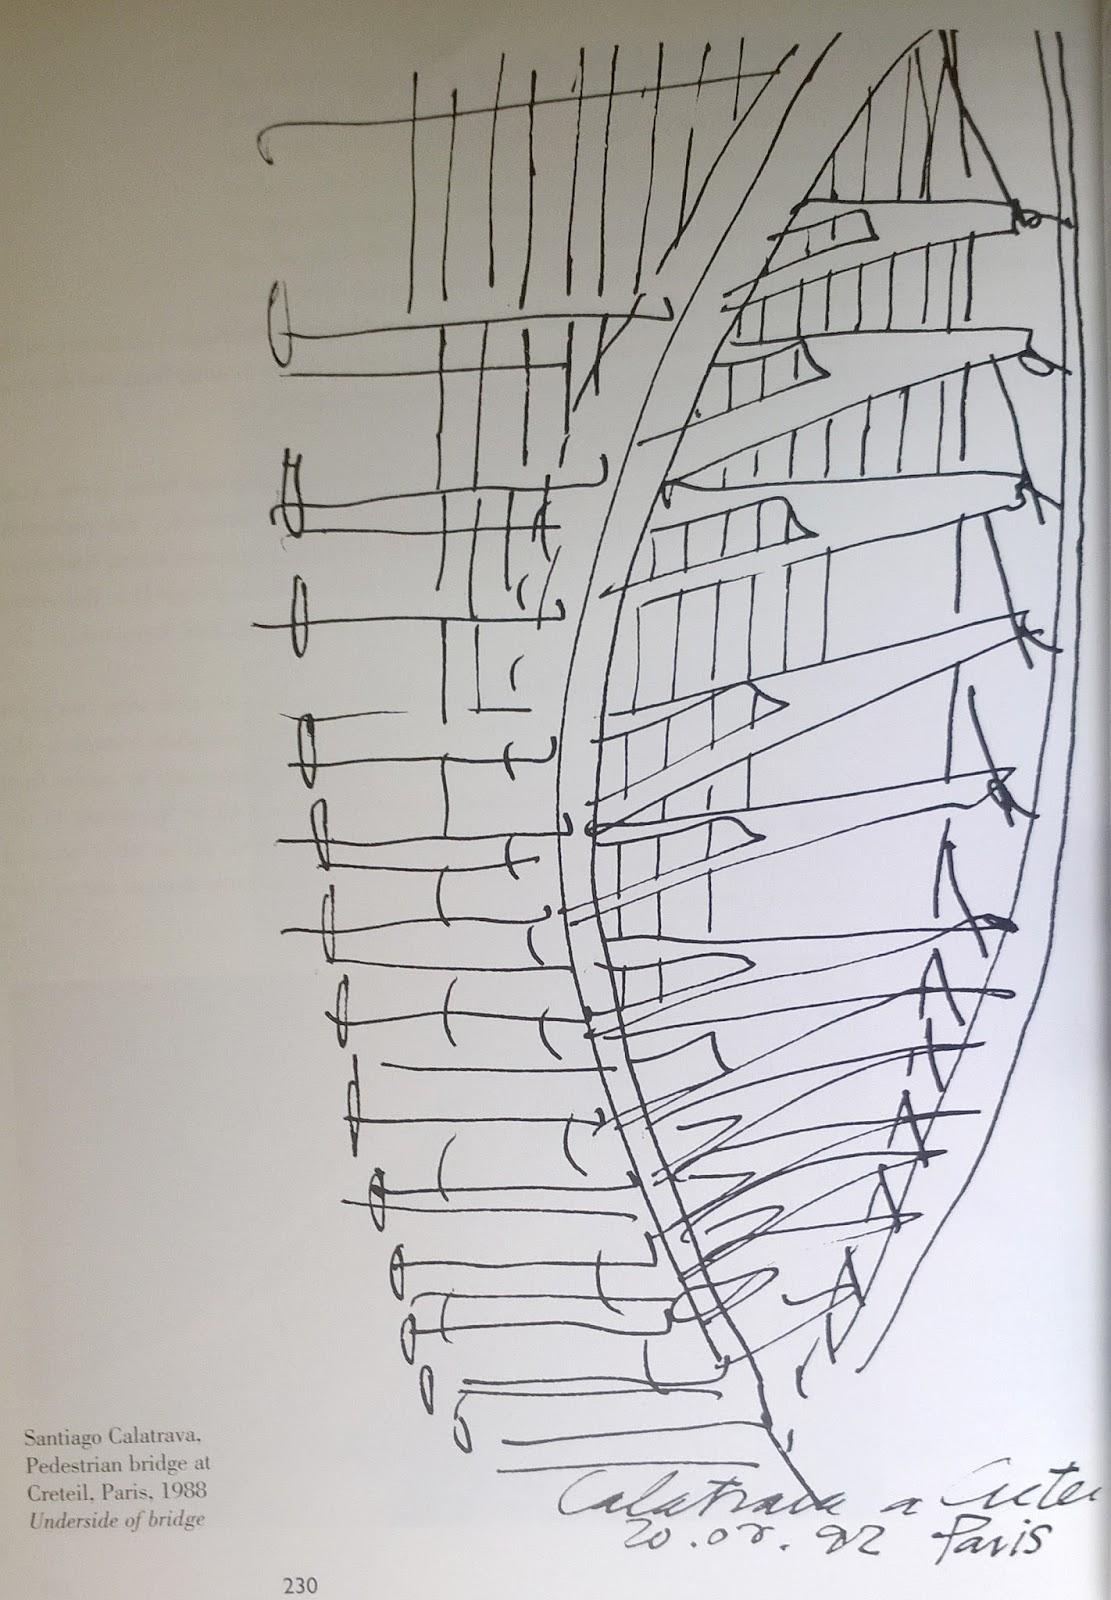 bản vẻ của kts calatrava